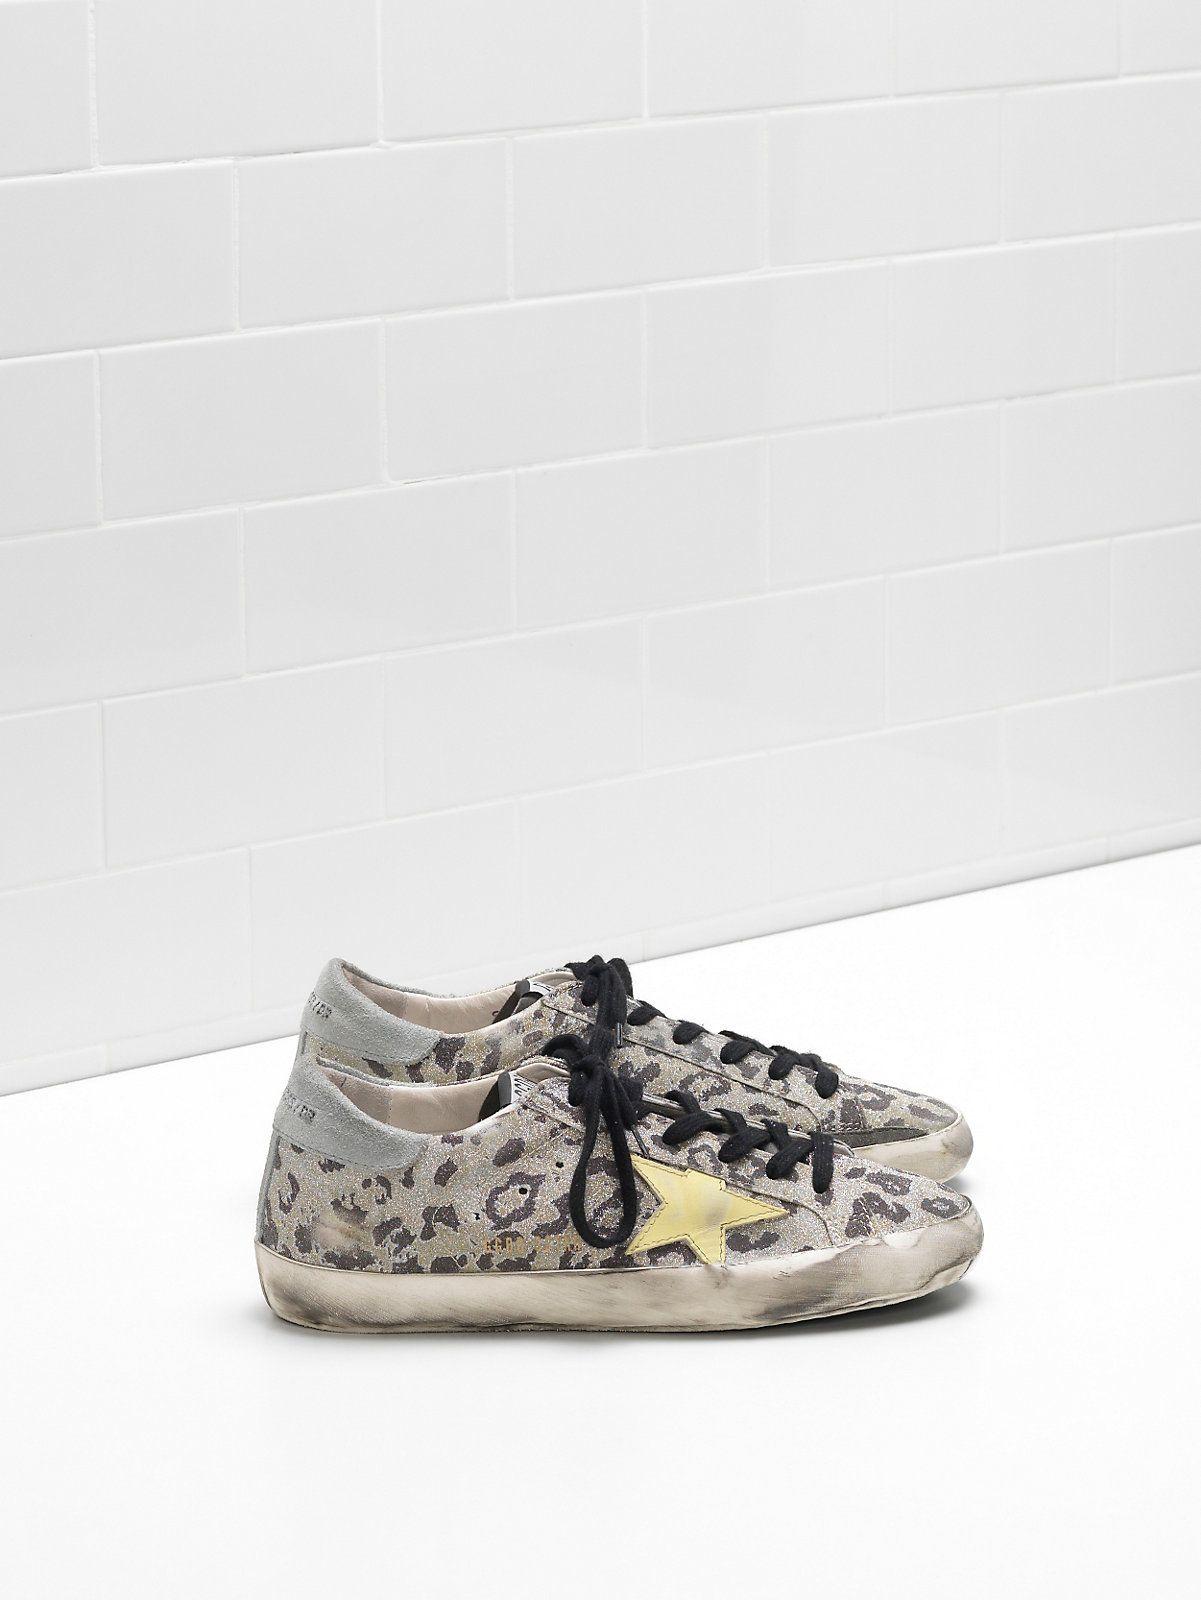 d2a986461b3dd Sneaker Outlet